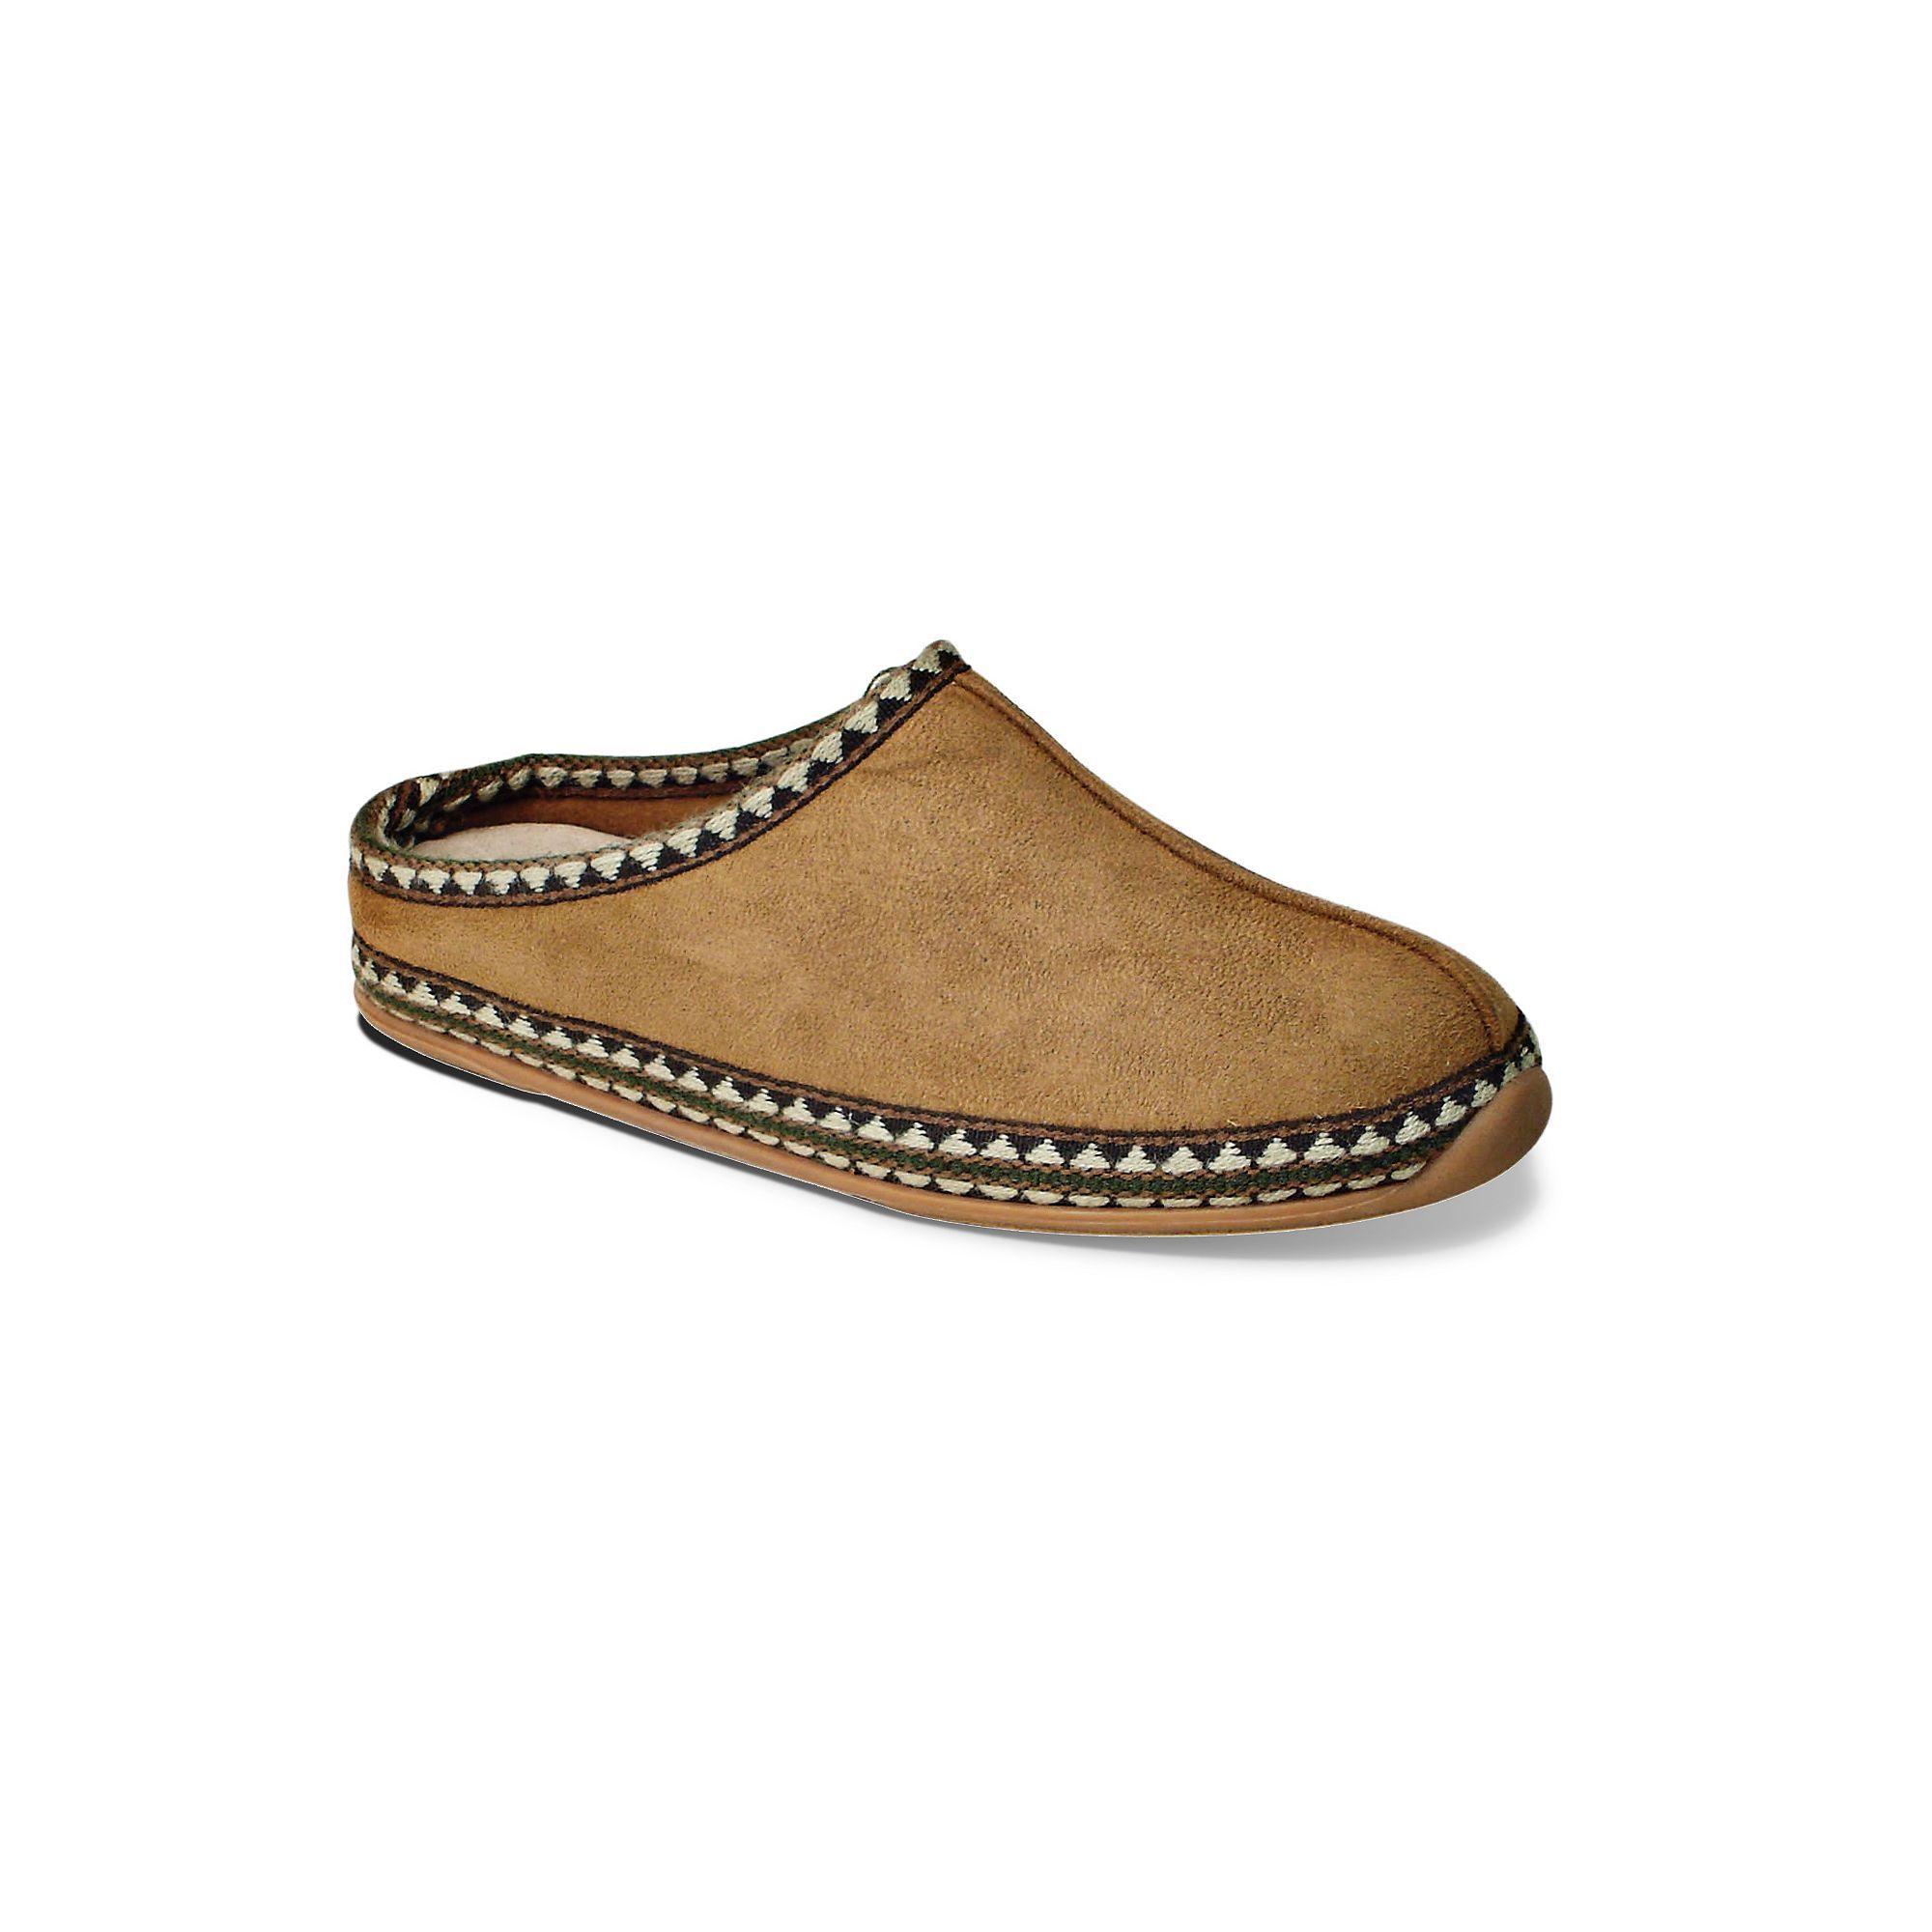 Deer Stags Slipperooz Wherever Men's Clog Slippers, Size: 15 Wide,  Beig/Green